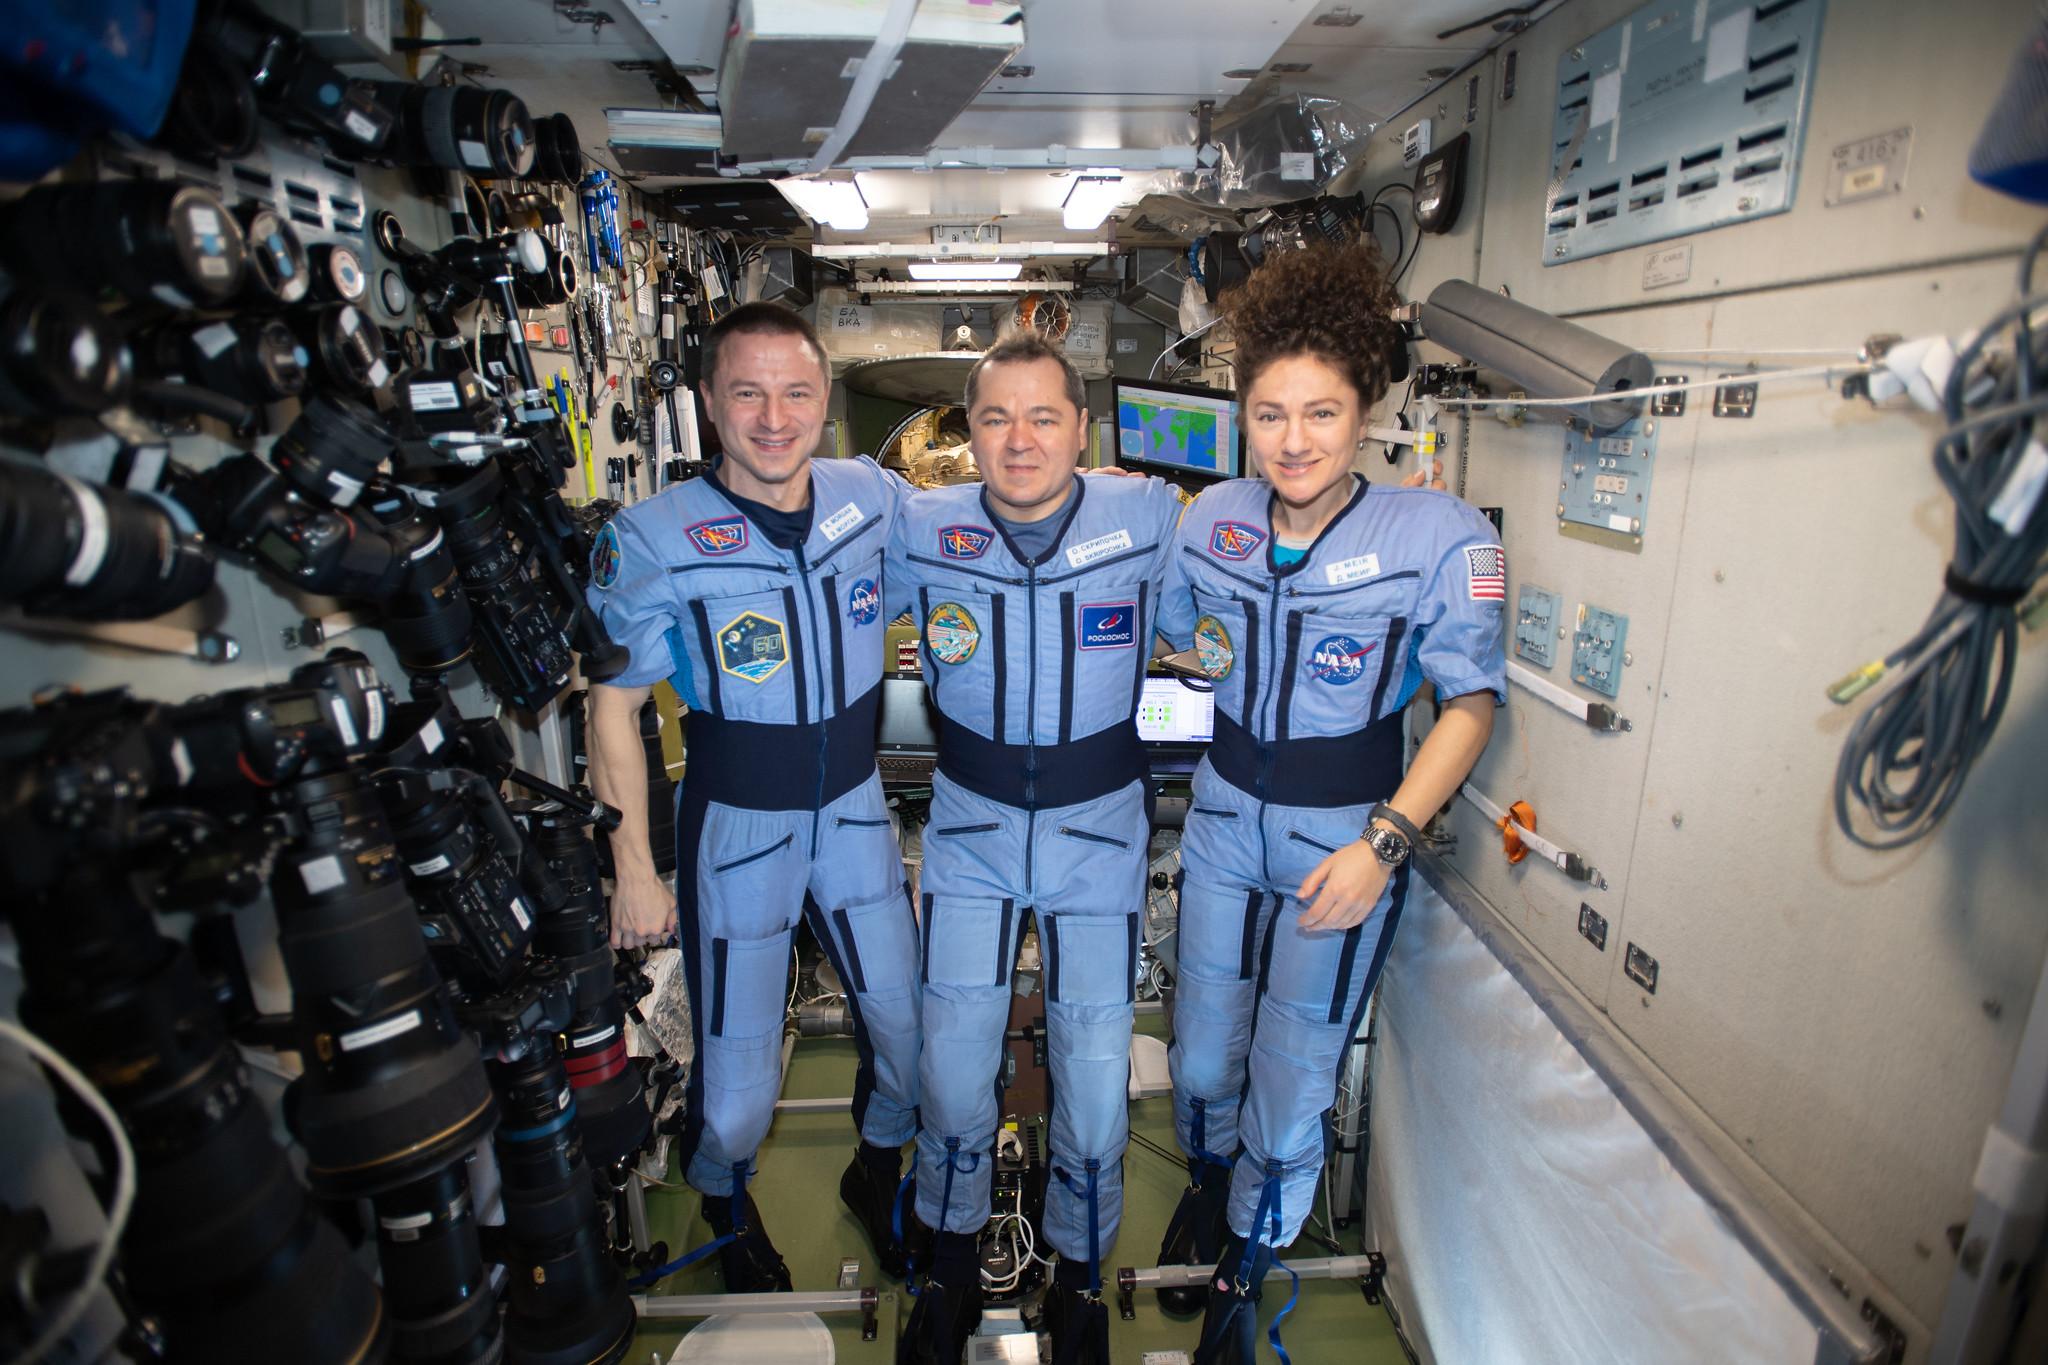 Figure 2: Andrew Morgan (NASA), Oleg Skripochka (Roscosmos) și Jessica Meir (NASA), înainte de a reveni pe Pământ. Sursa foto: NASA